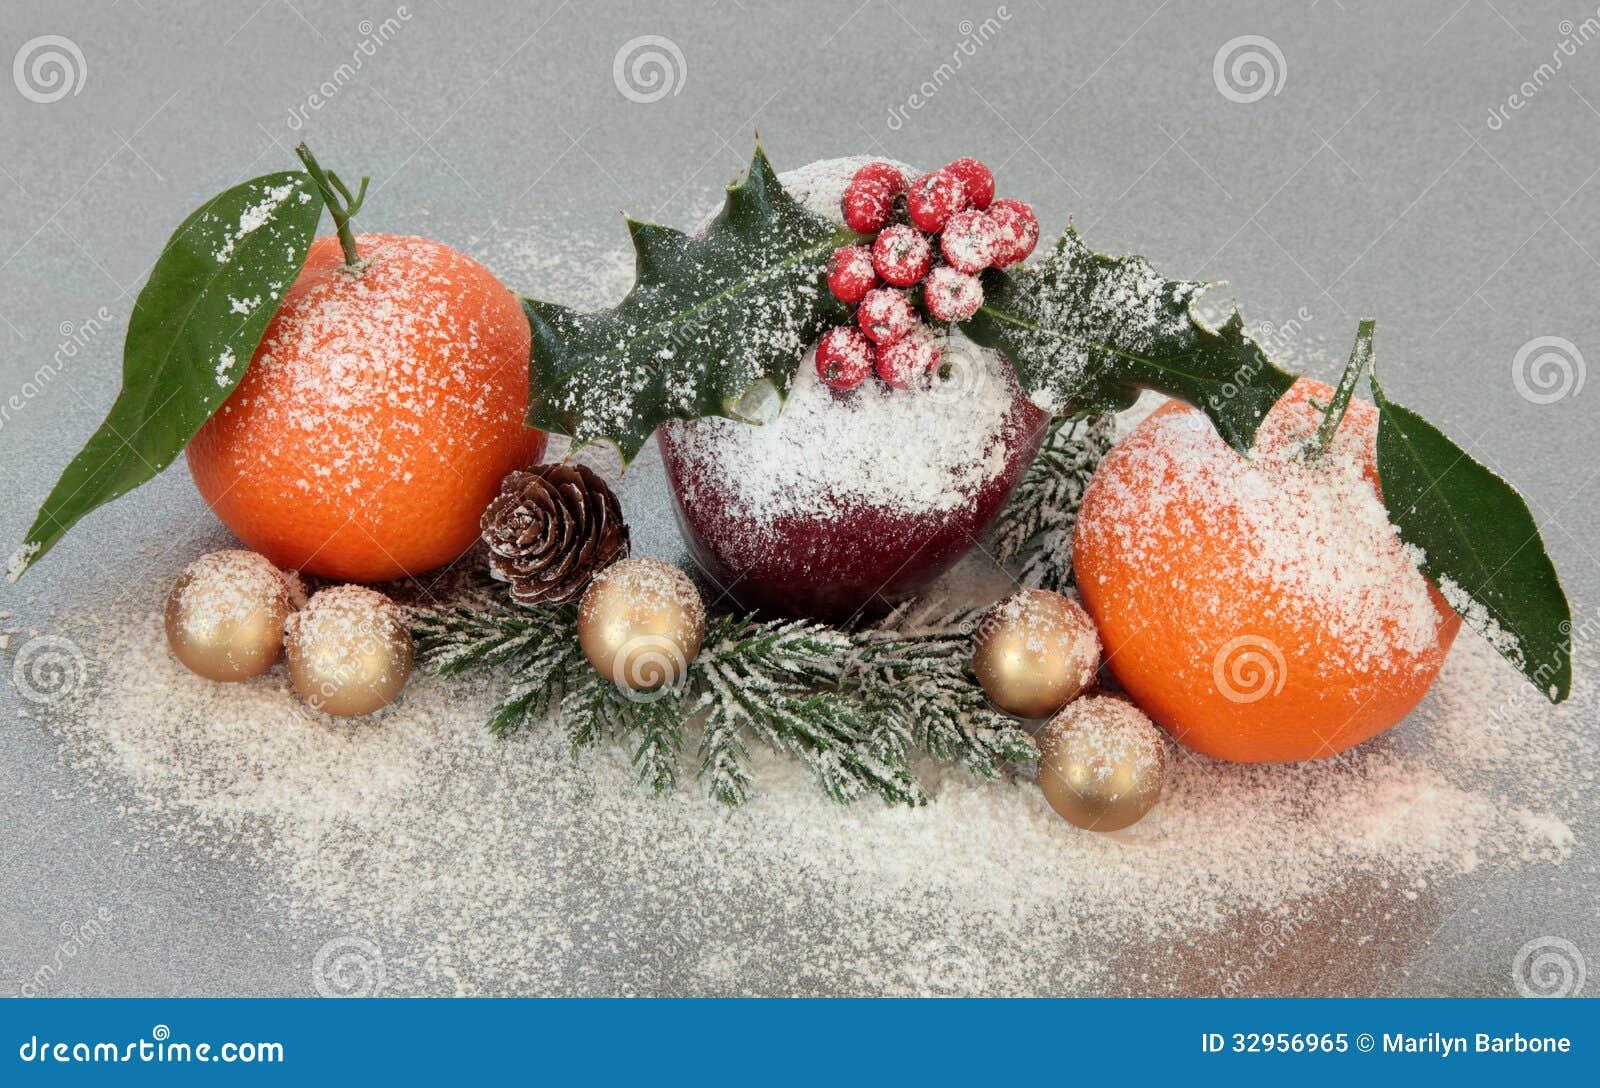 Christmas fruit decoration royalty free stock photo for Apple fruit decoration